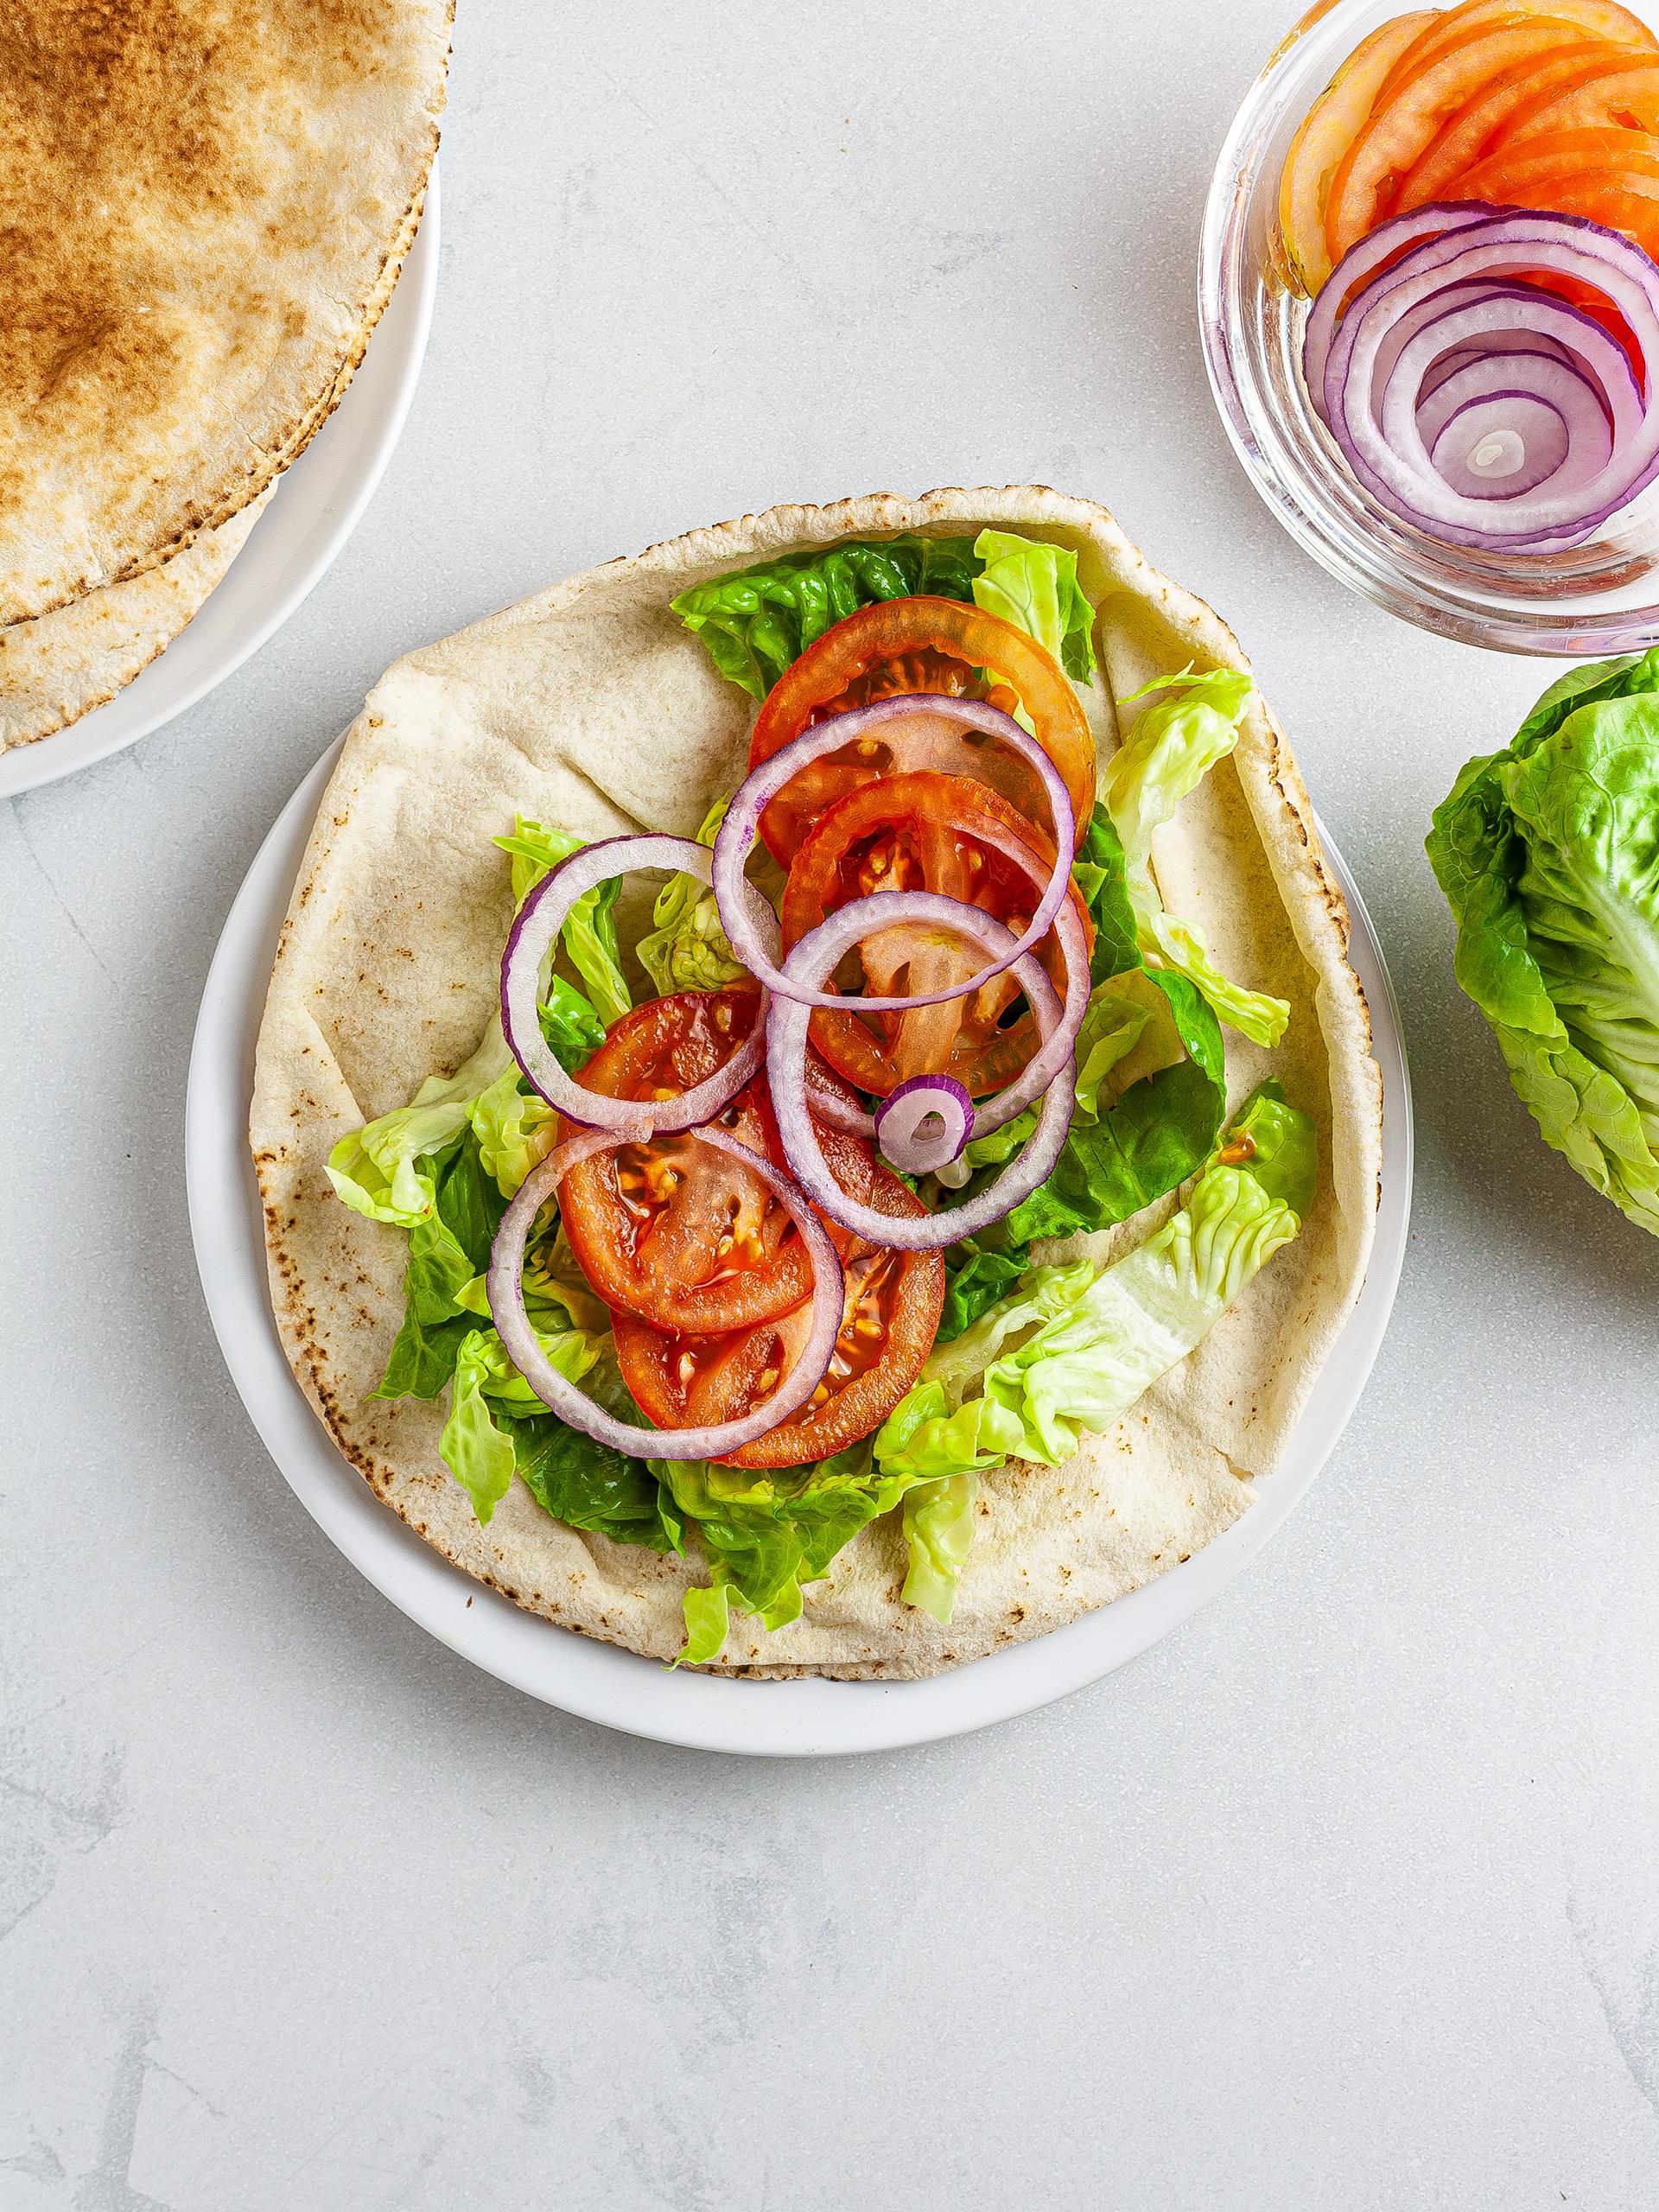 Step 3.2 of Vegan King Oyster Mushroom Shawarma